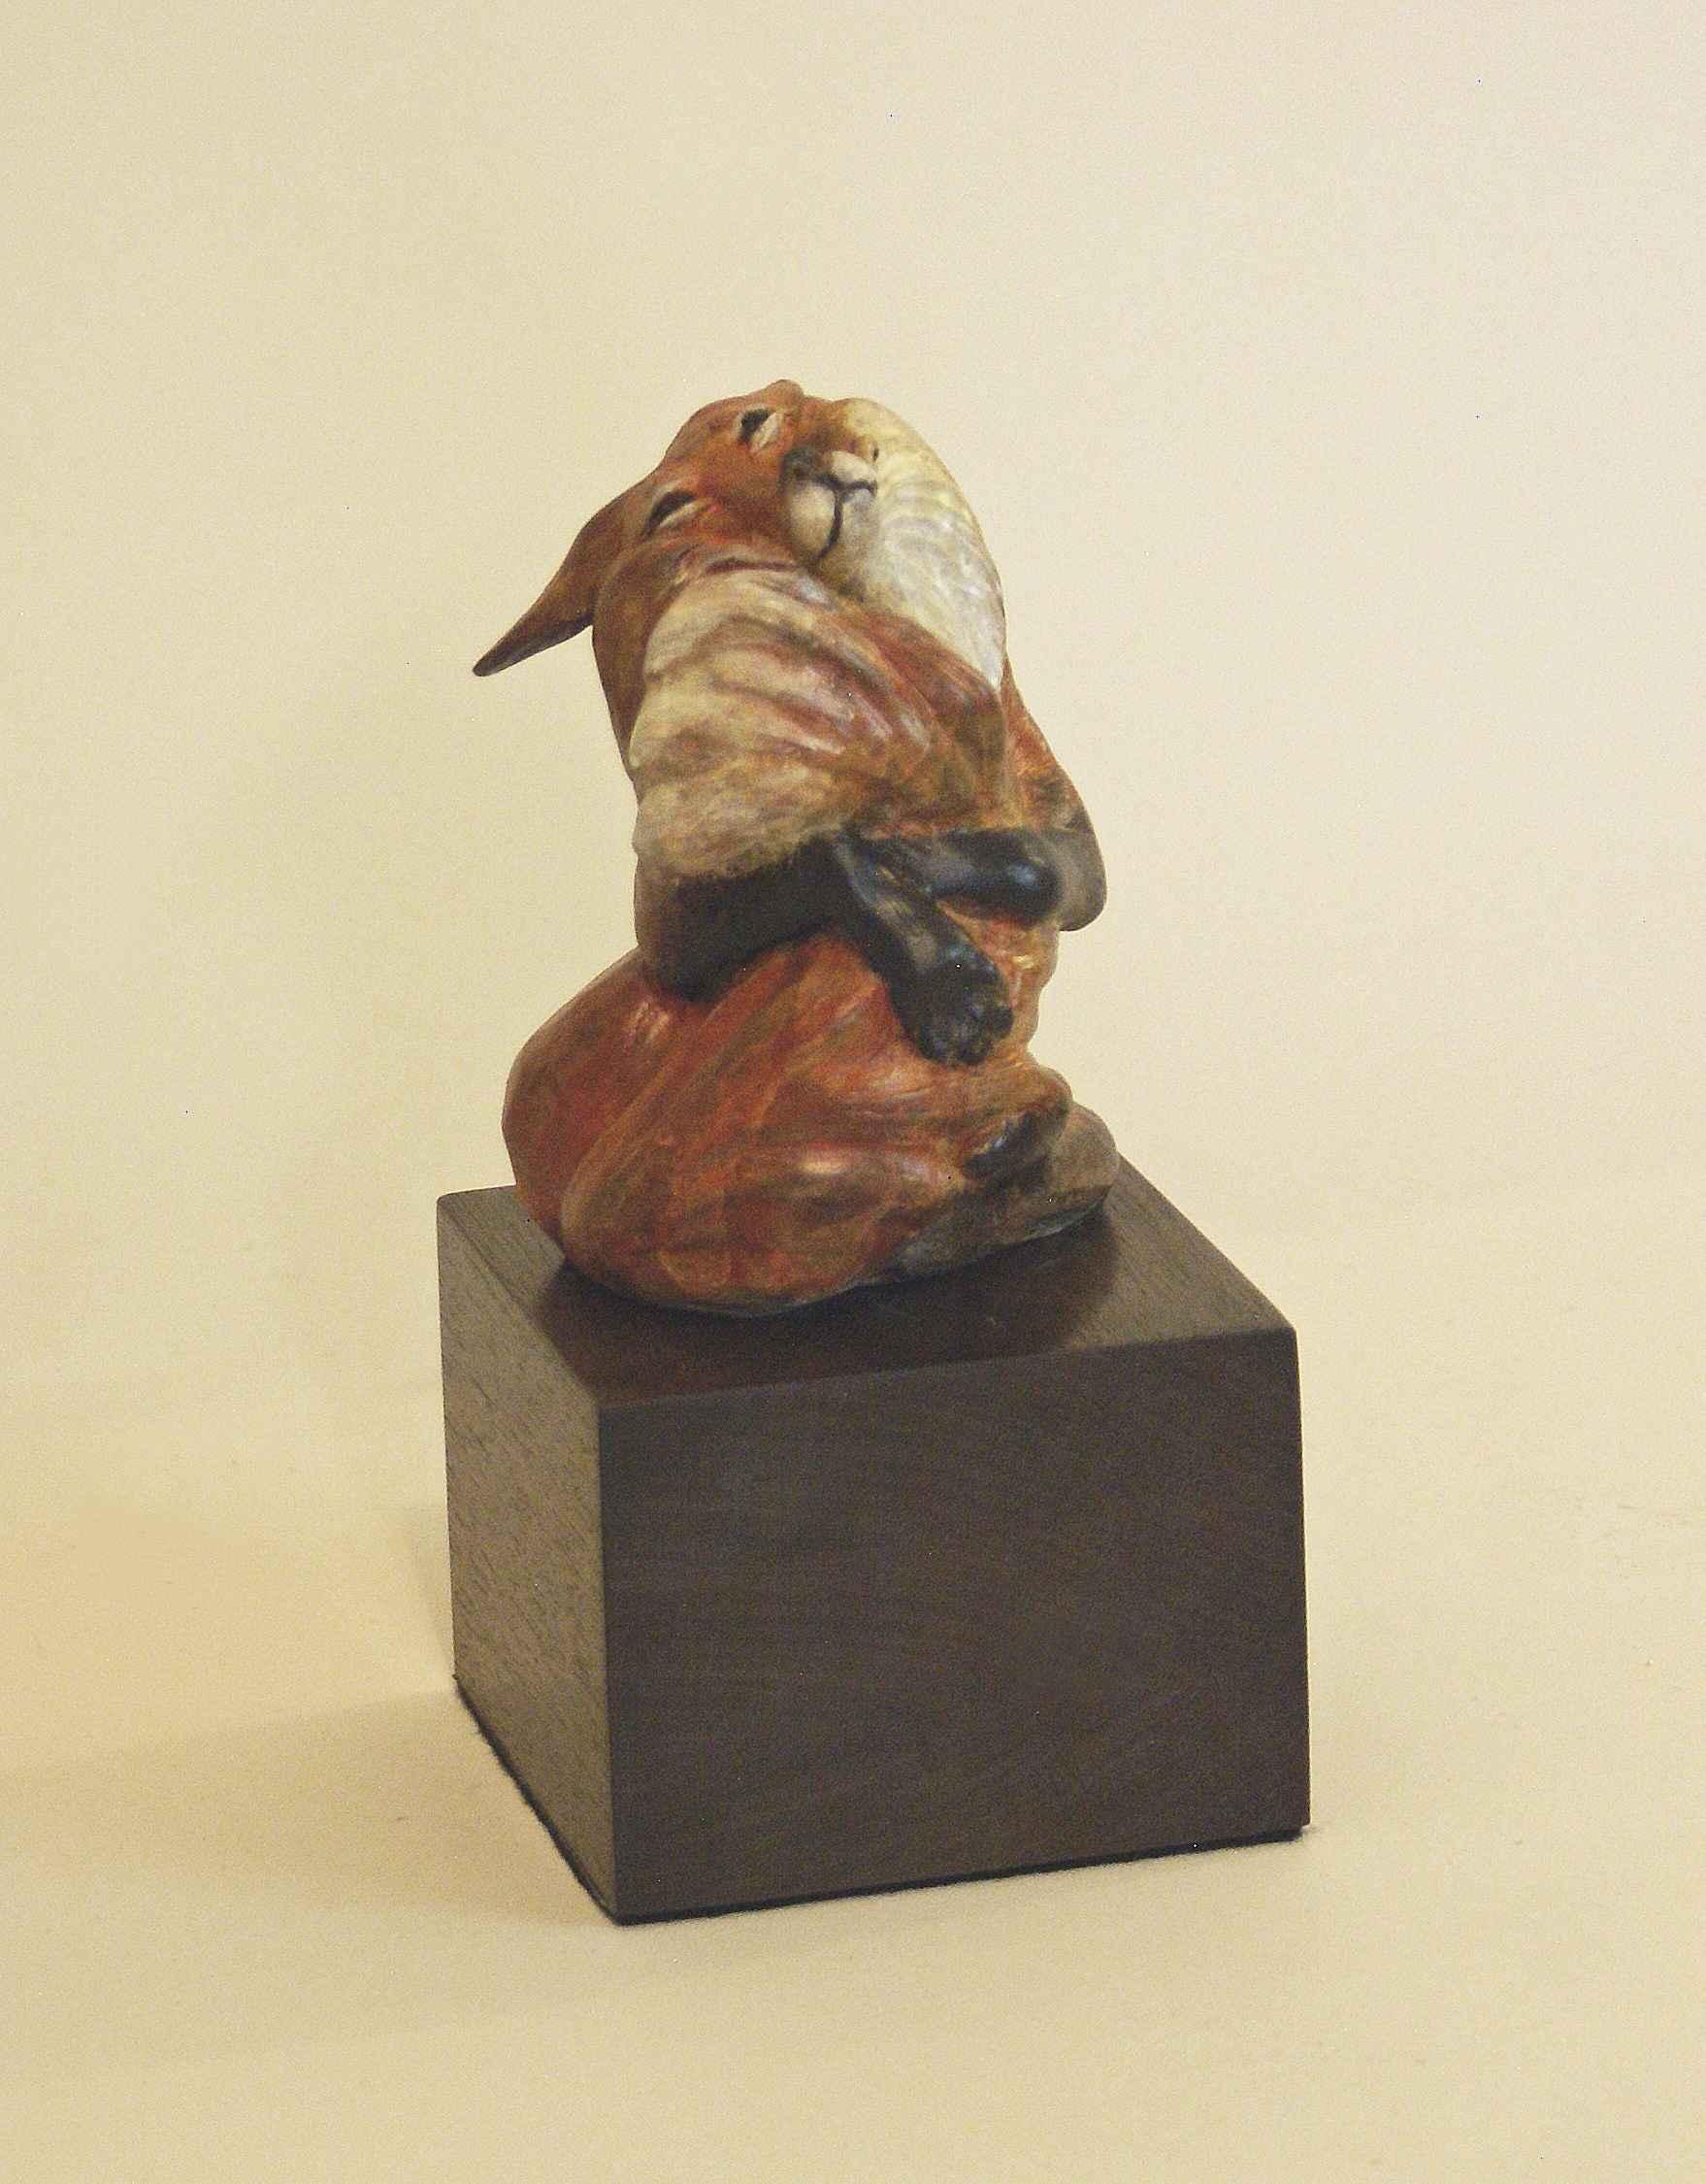 Farafel 3/30 by Ms Susan Norris - Masterpiece Online